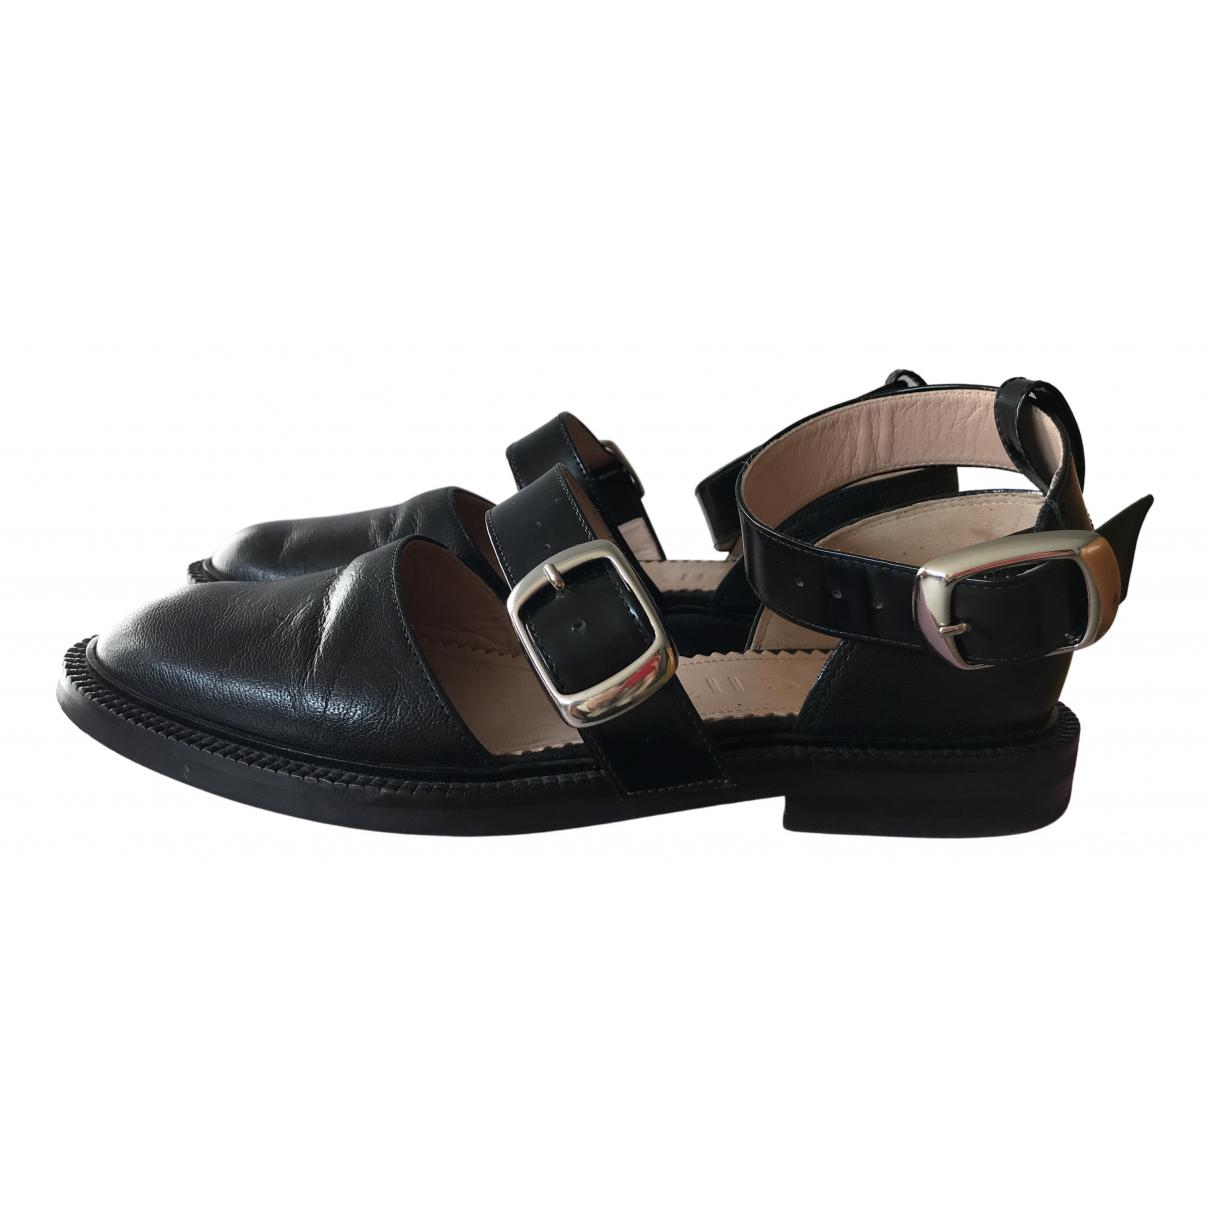 Inch2 \N Black Leather Flats for Women 37 EU